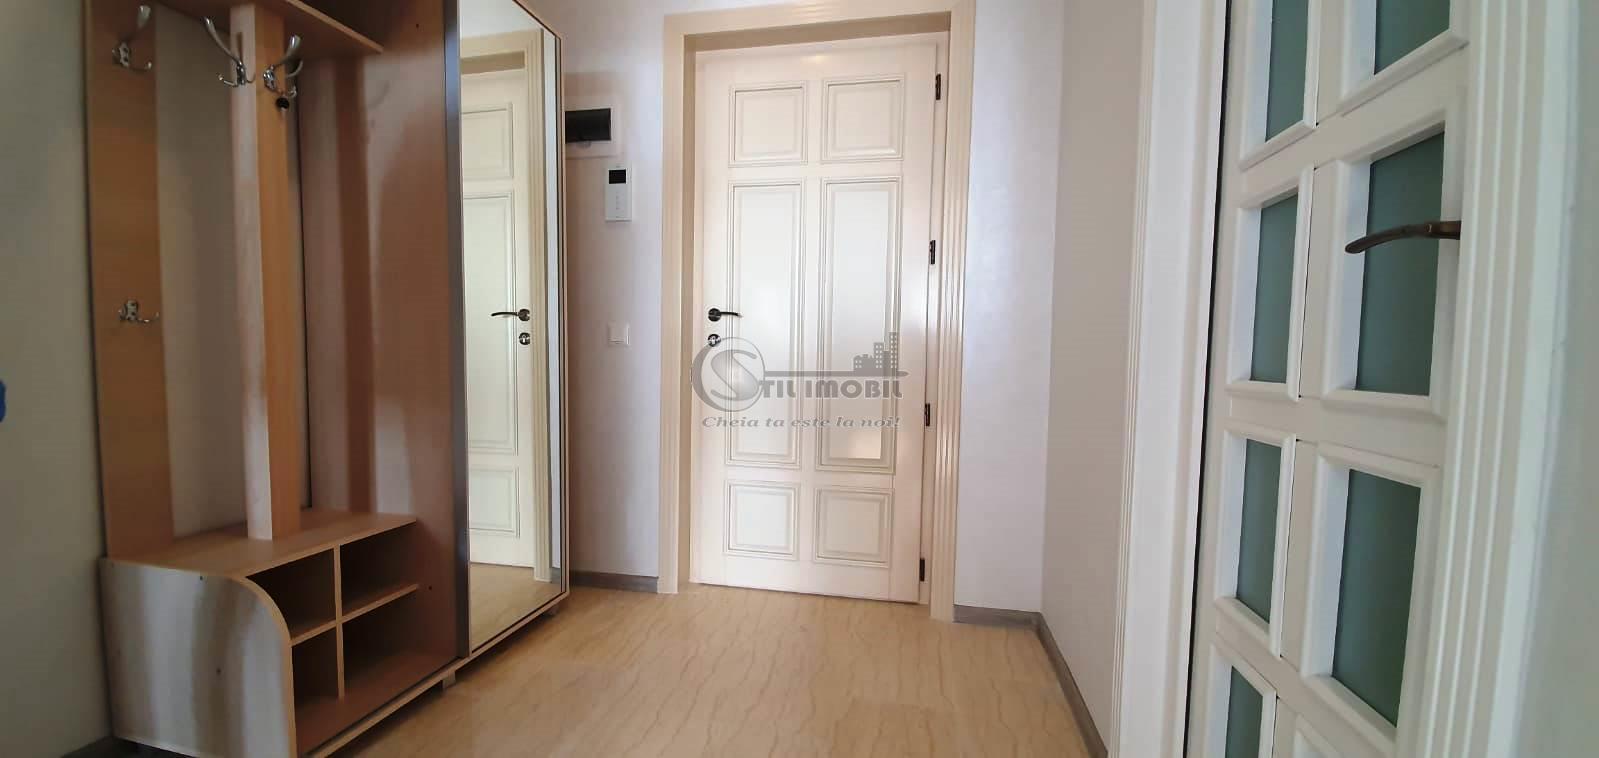 Apartament 2 camere NOU Podul de Fier - Roua Residence